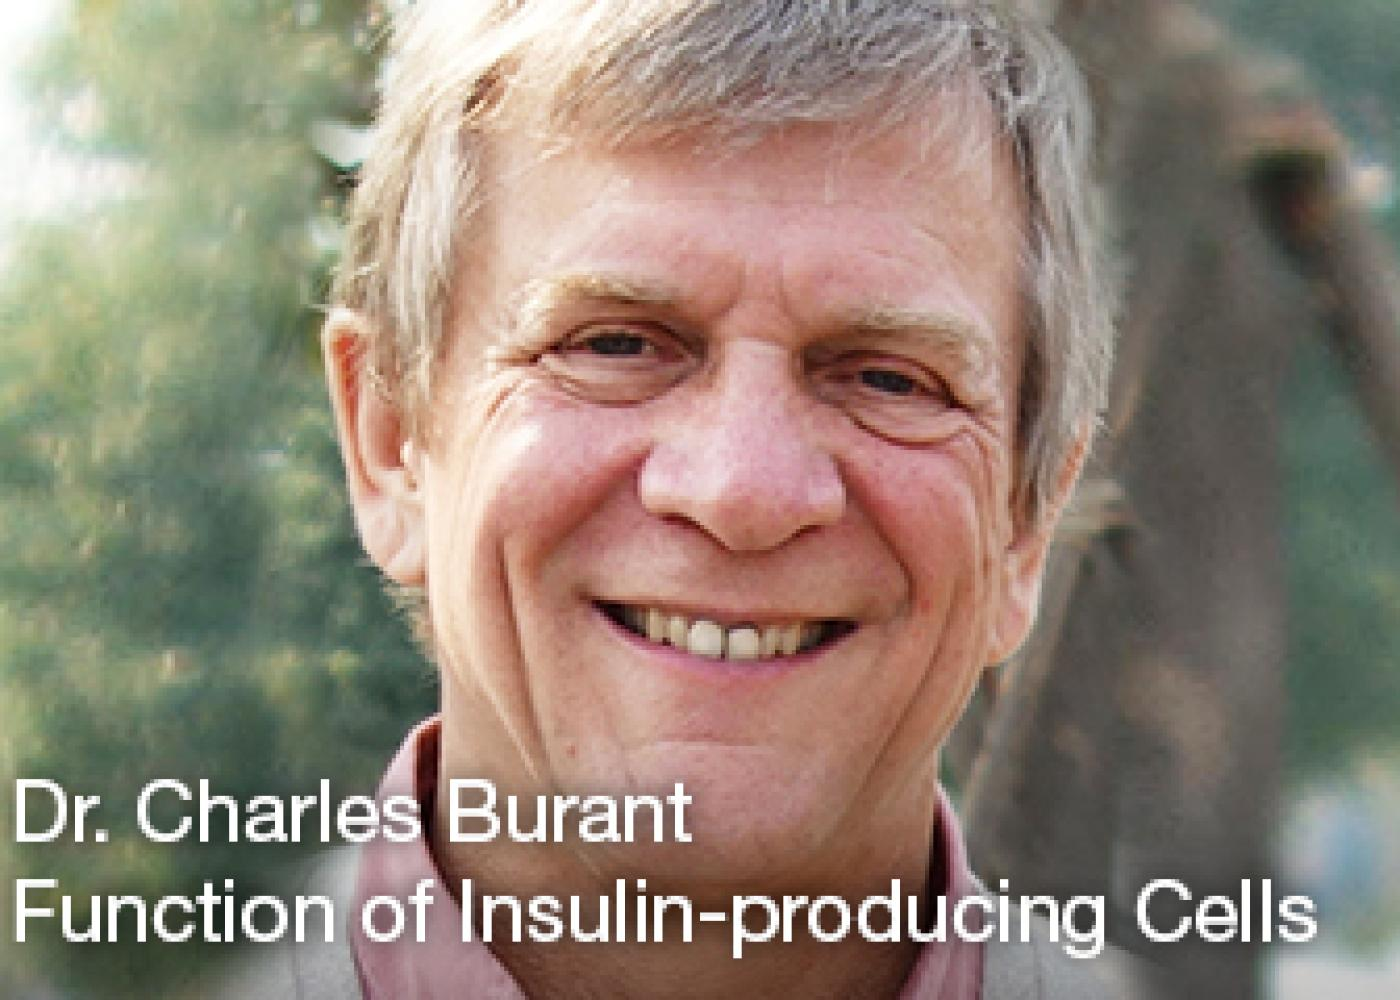 Charles burant headshot